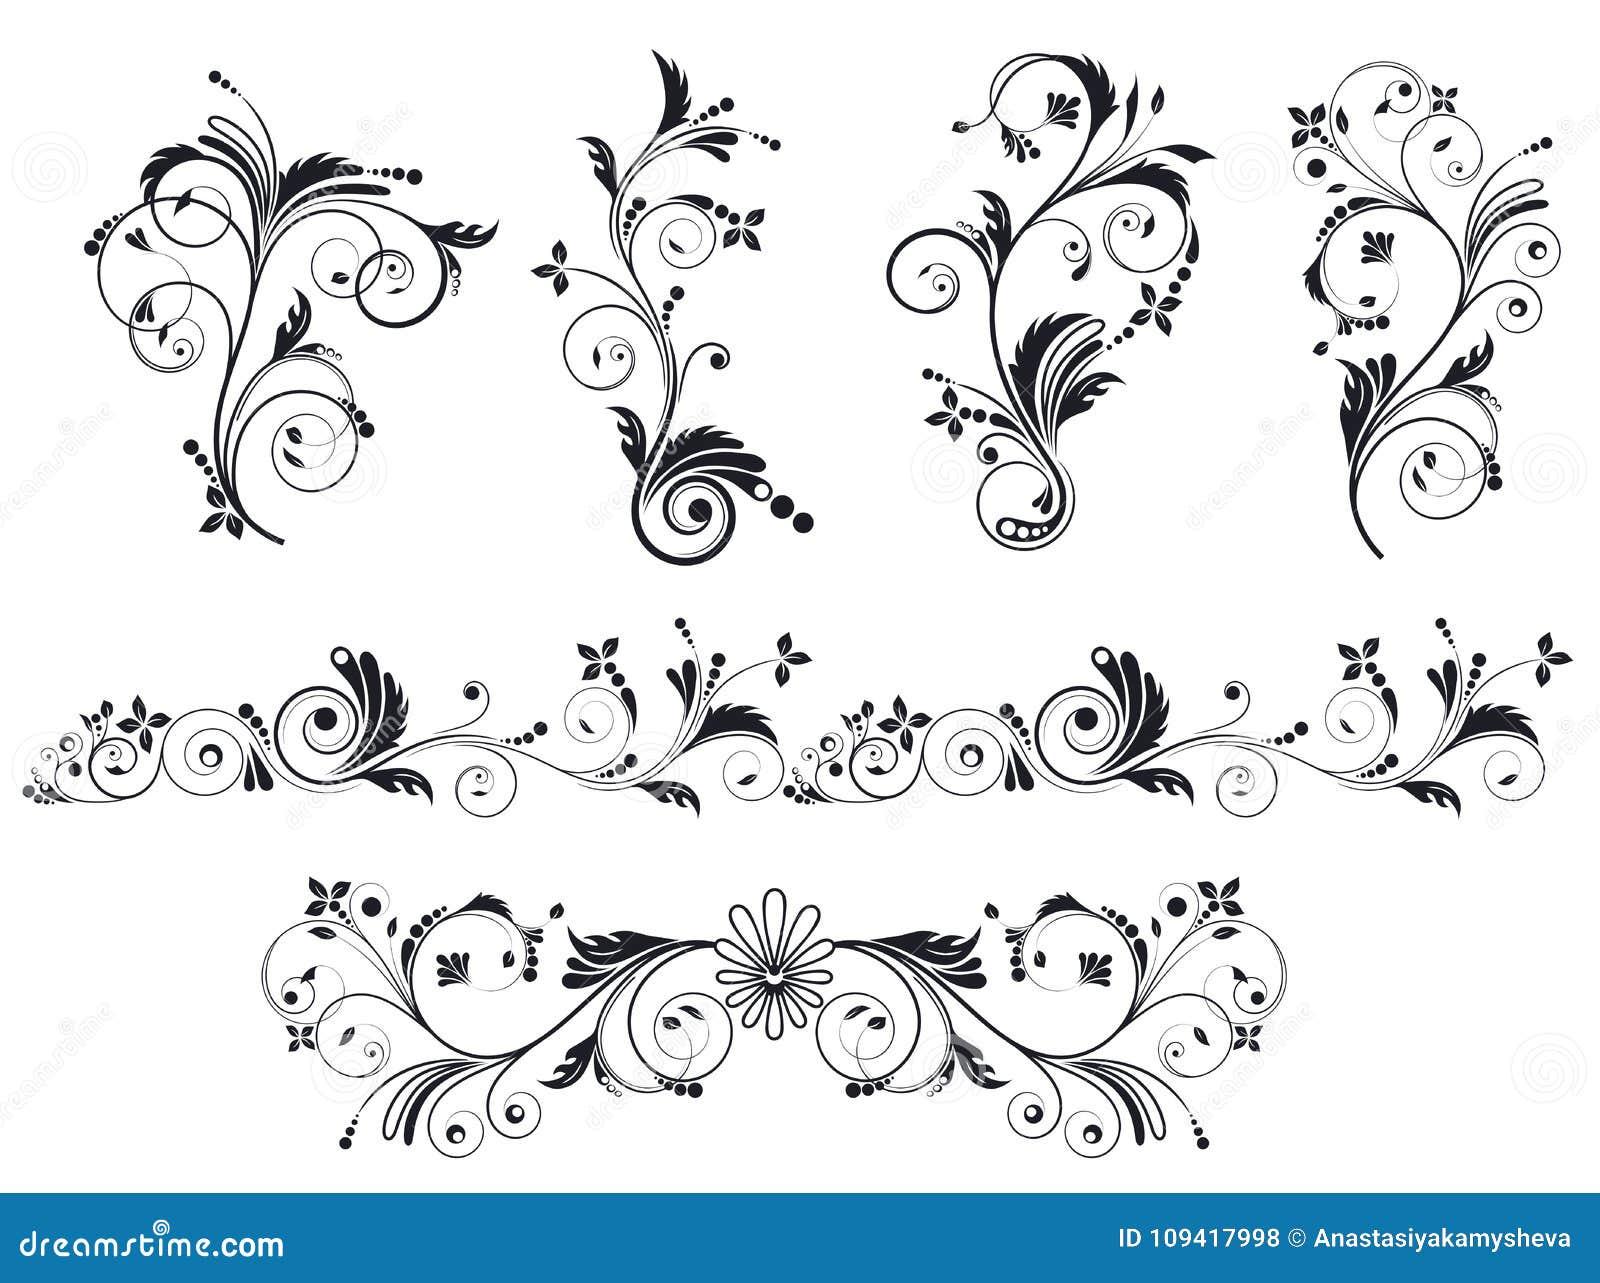 Black And White Vectore Curl Florish Vignette Set Stock Vector Illustration Of Flourish Decorative 109417998